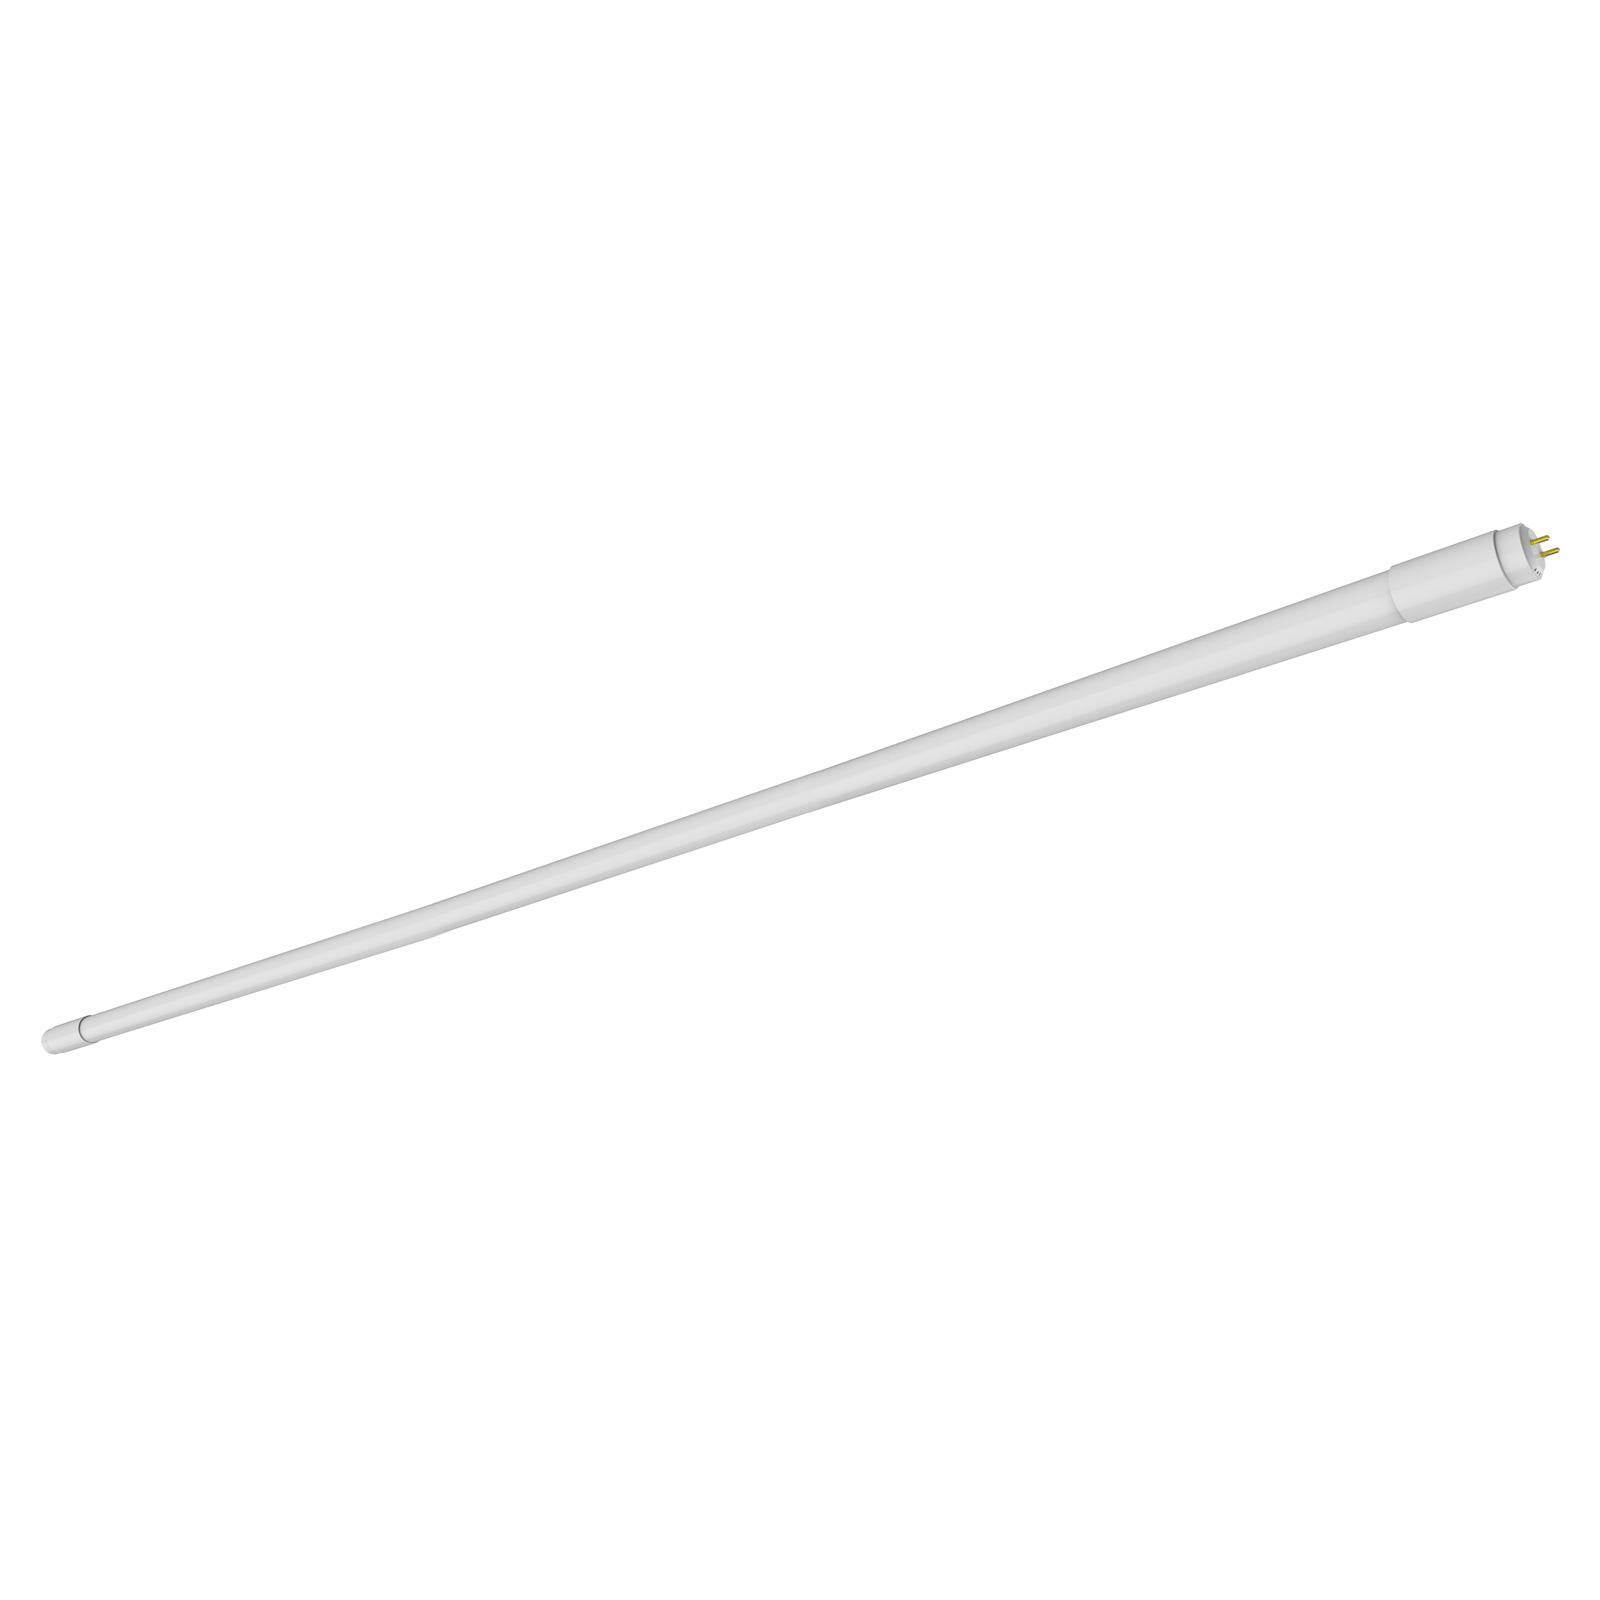 LED-Tube ToLEDo Superia G13 150cm 24W 6.500K